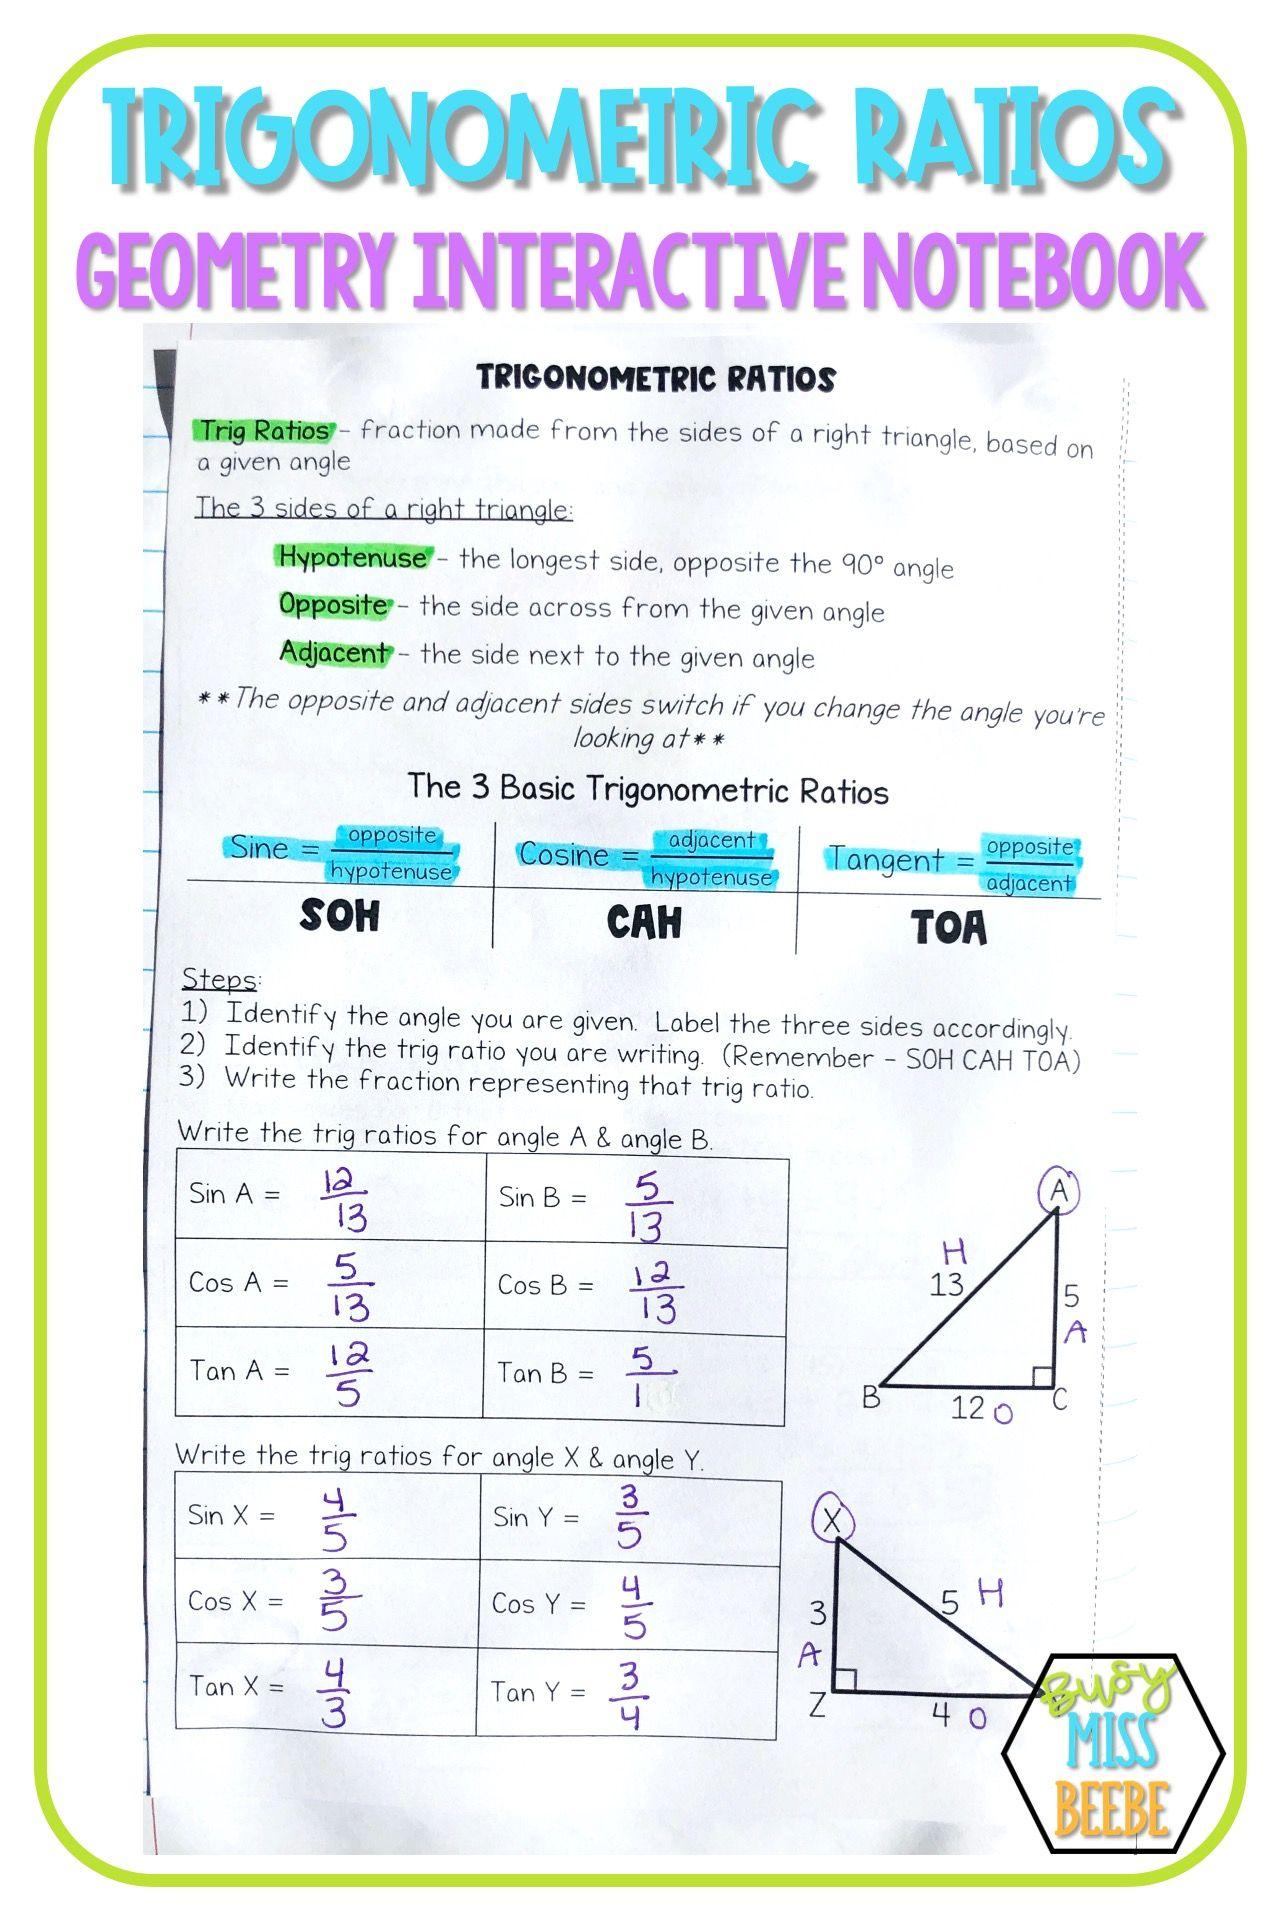 Geometry Interactive Notebook Trigonometric Ratios In 2020 Geometry Interactive Notebook Interactive Notebooks Geometry High School